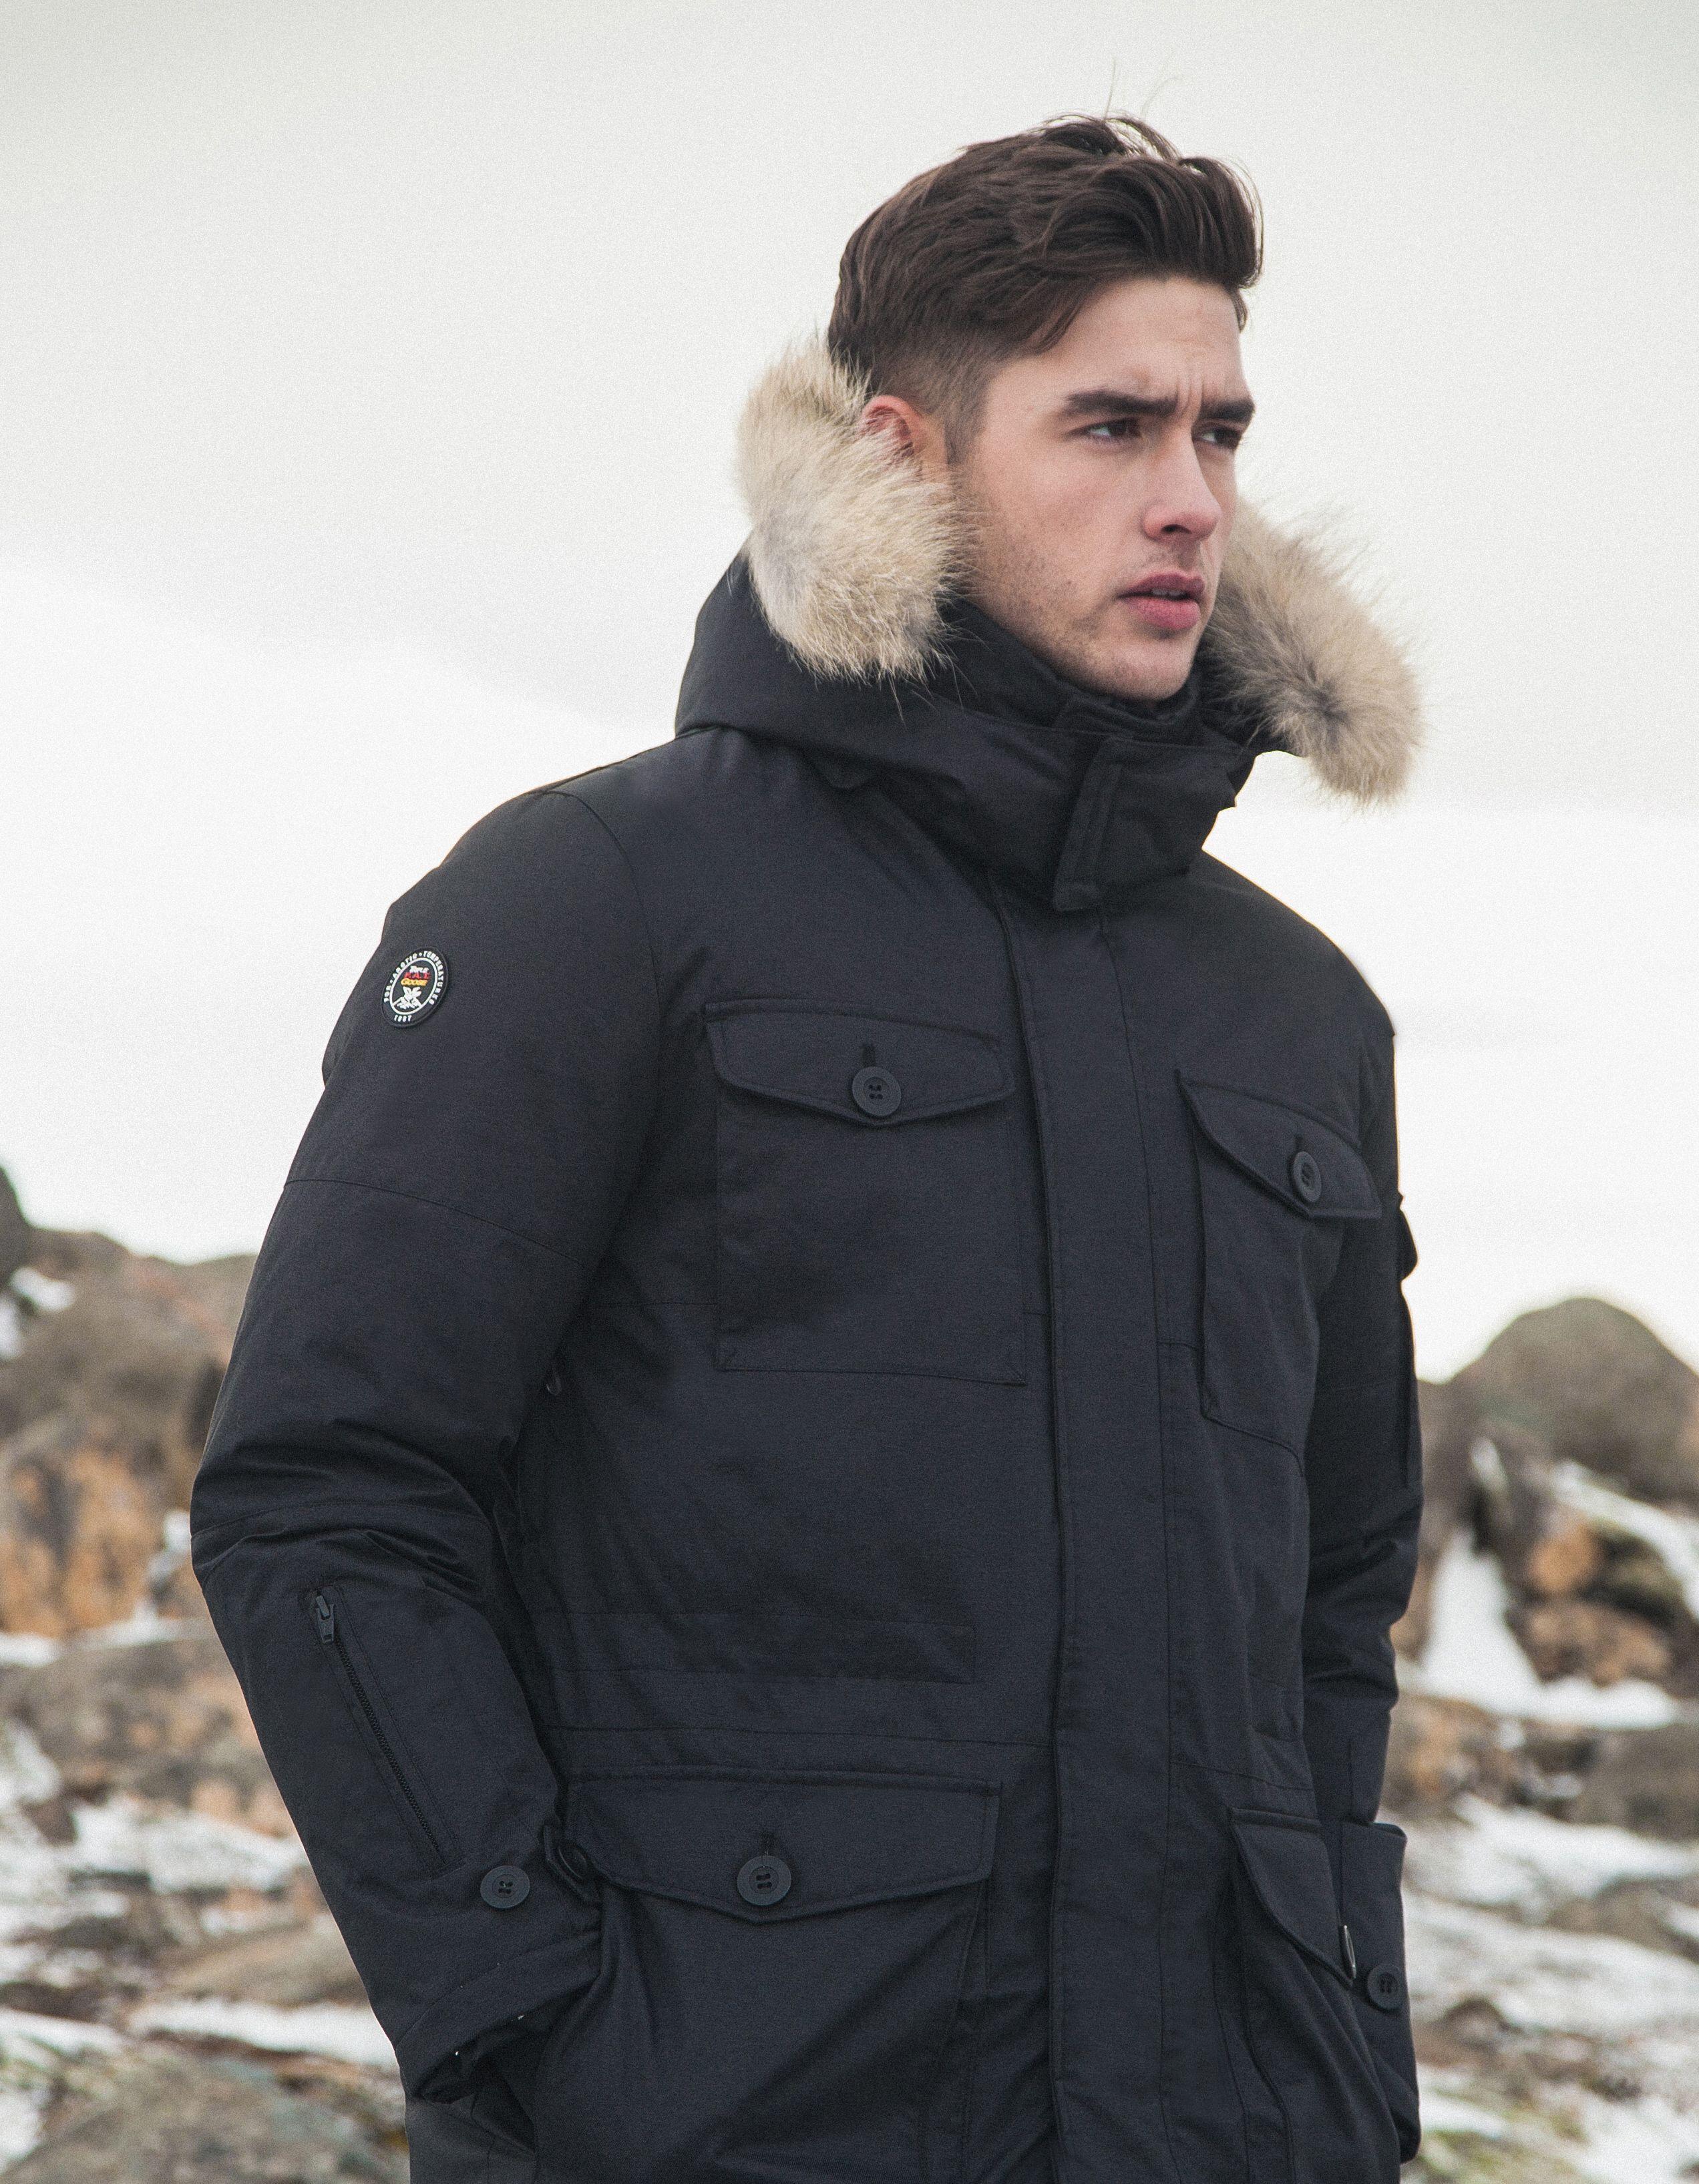 2019 Mens Parka Jacket Winter Fleece Multi-pocket Casual Quilted Jacket Men Winter Coats Winter Clothes Bubble Coat Good Heat Preservation Parkas